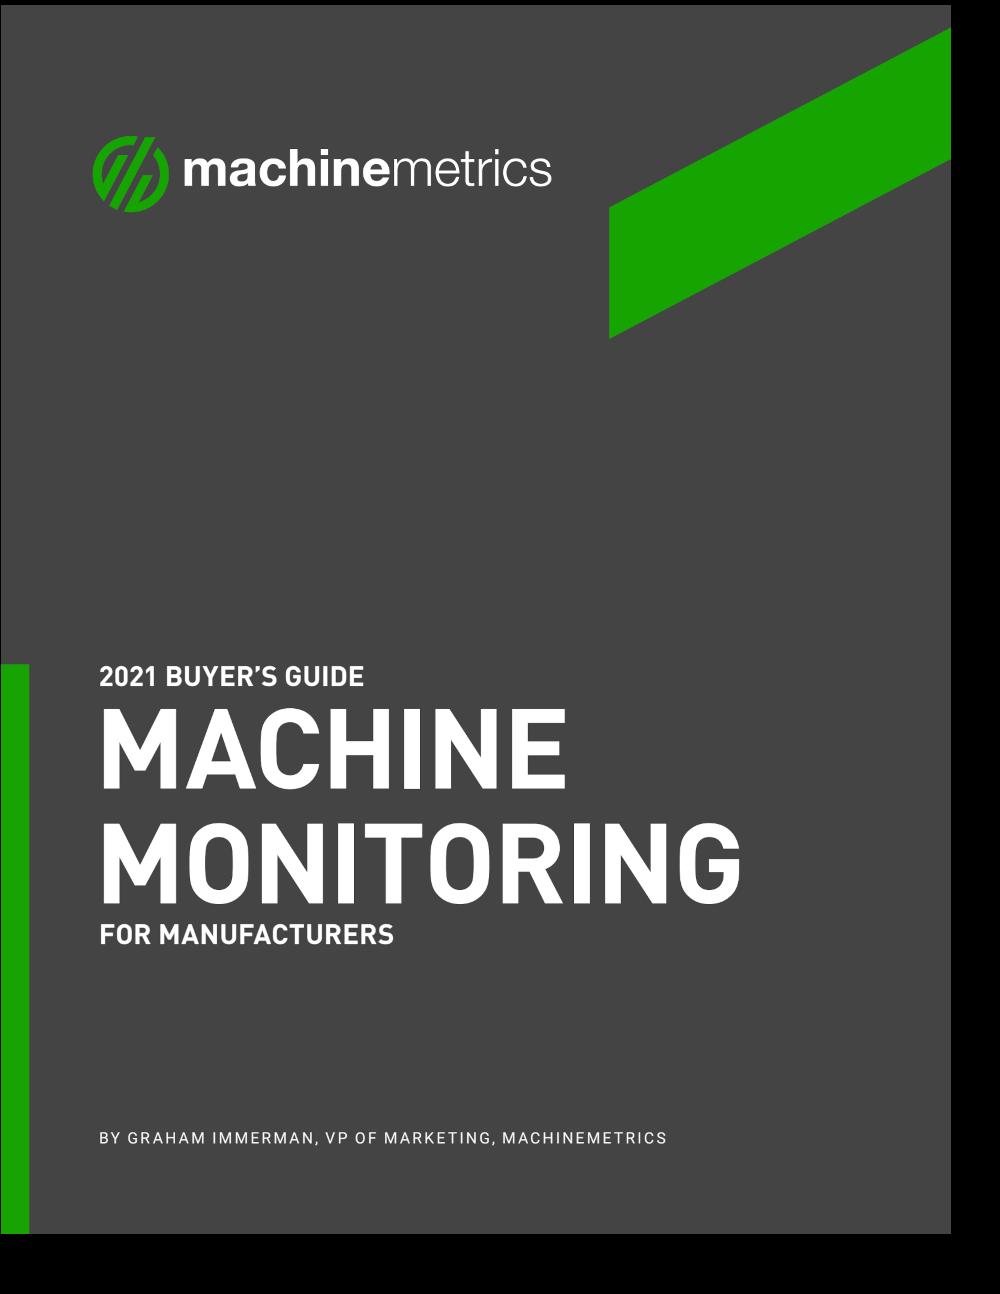 Machine Monitoring Cover Image 4